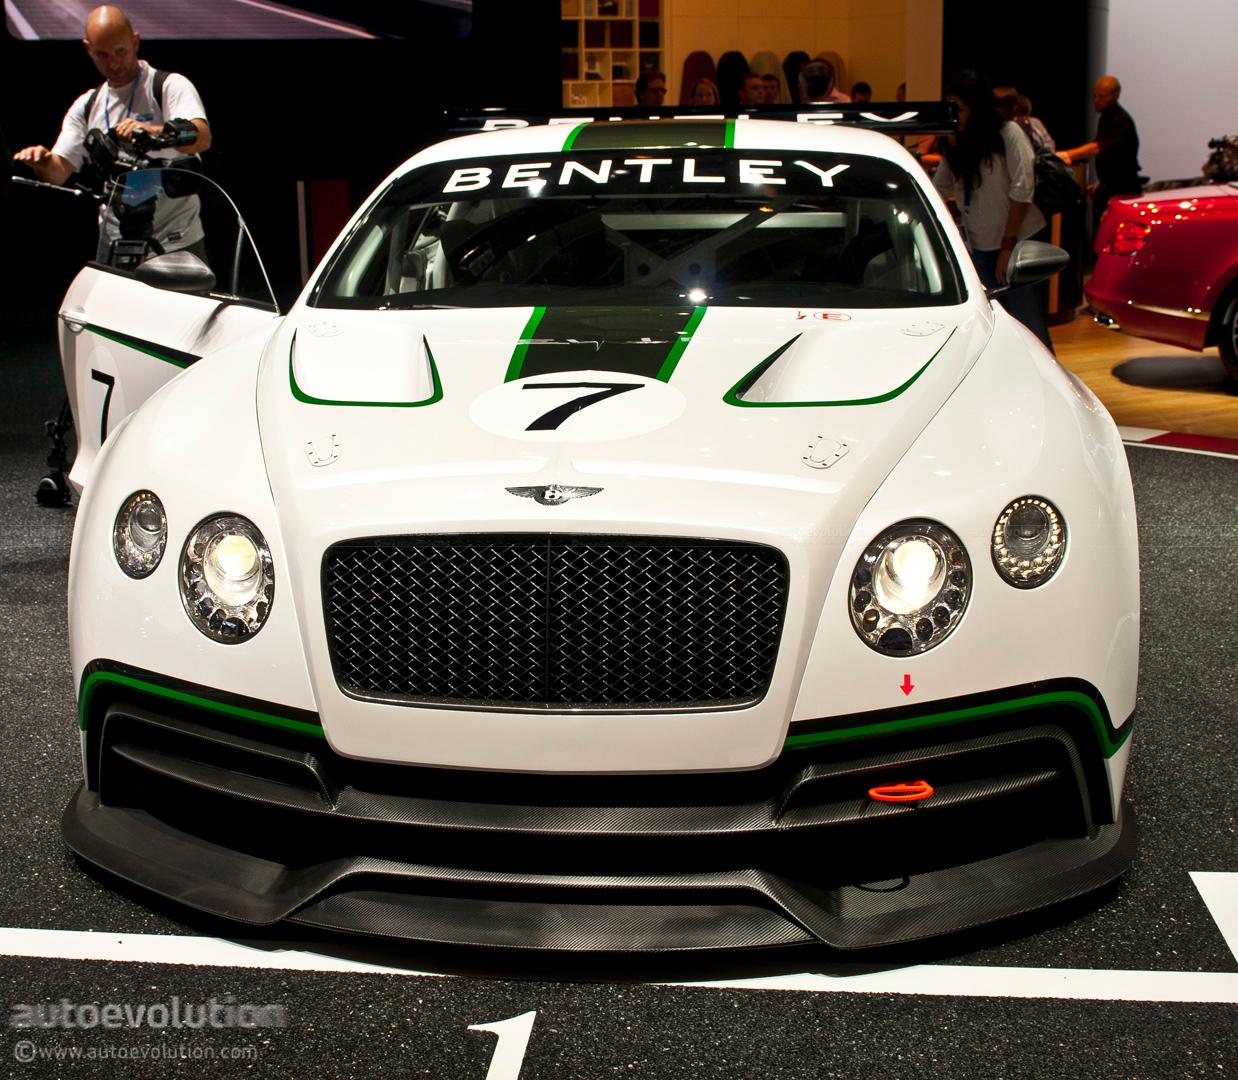 2012 Bentley Continental Camshaft: Paris 2012: Bentley Continental GT3 Racer [Live Photos